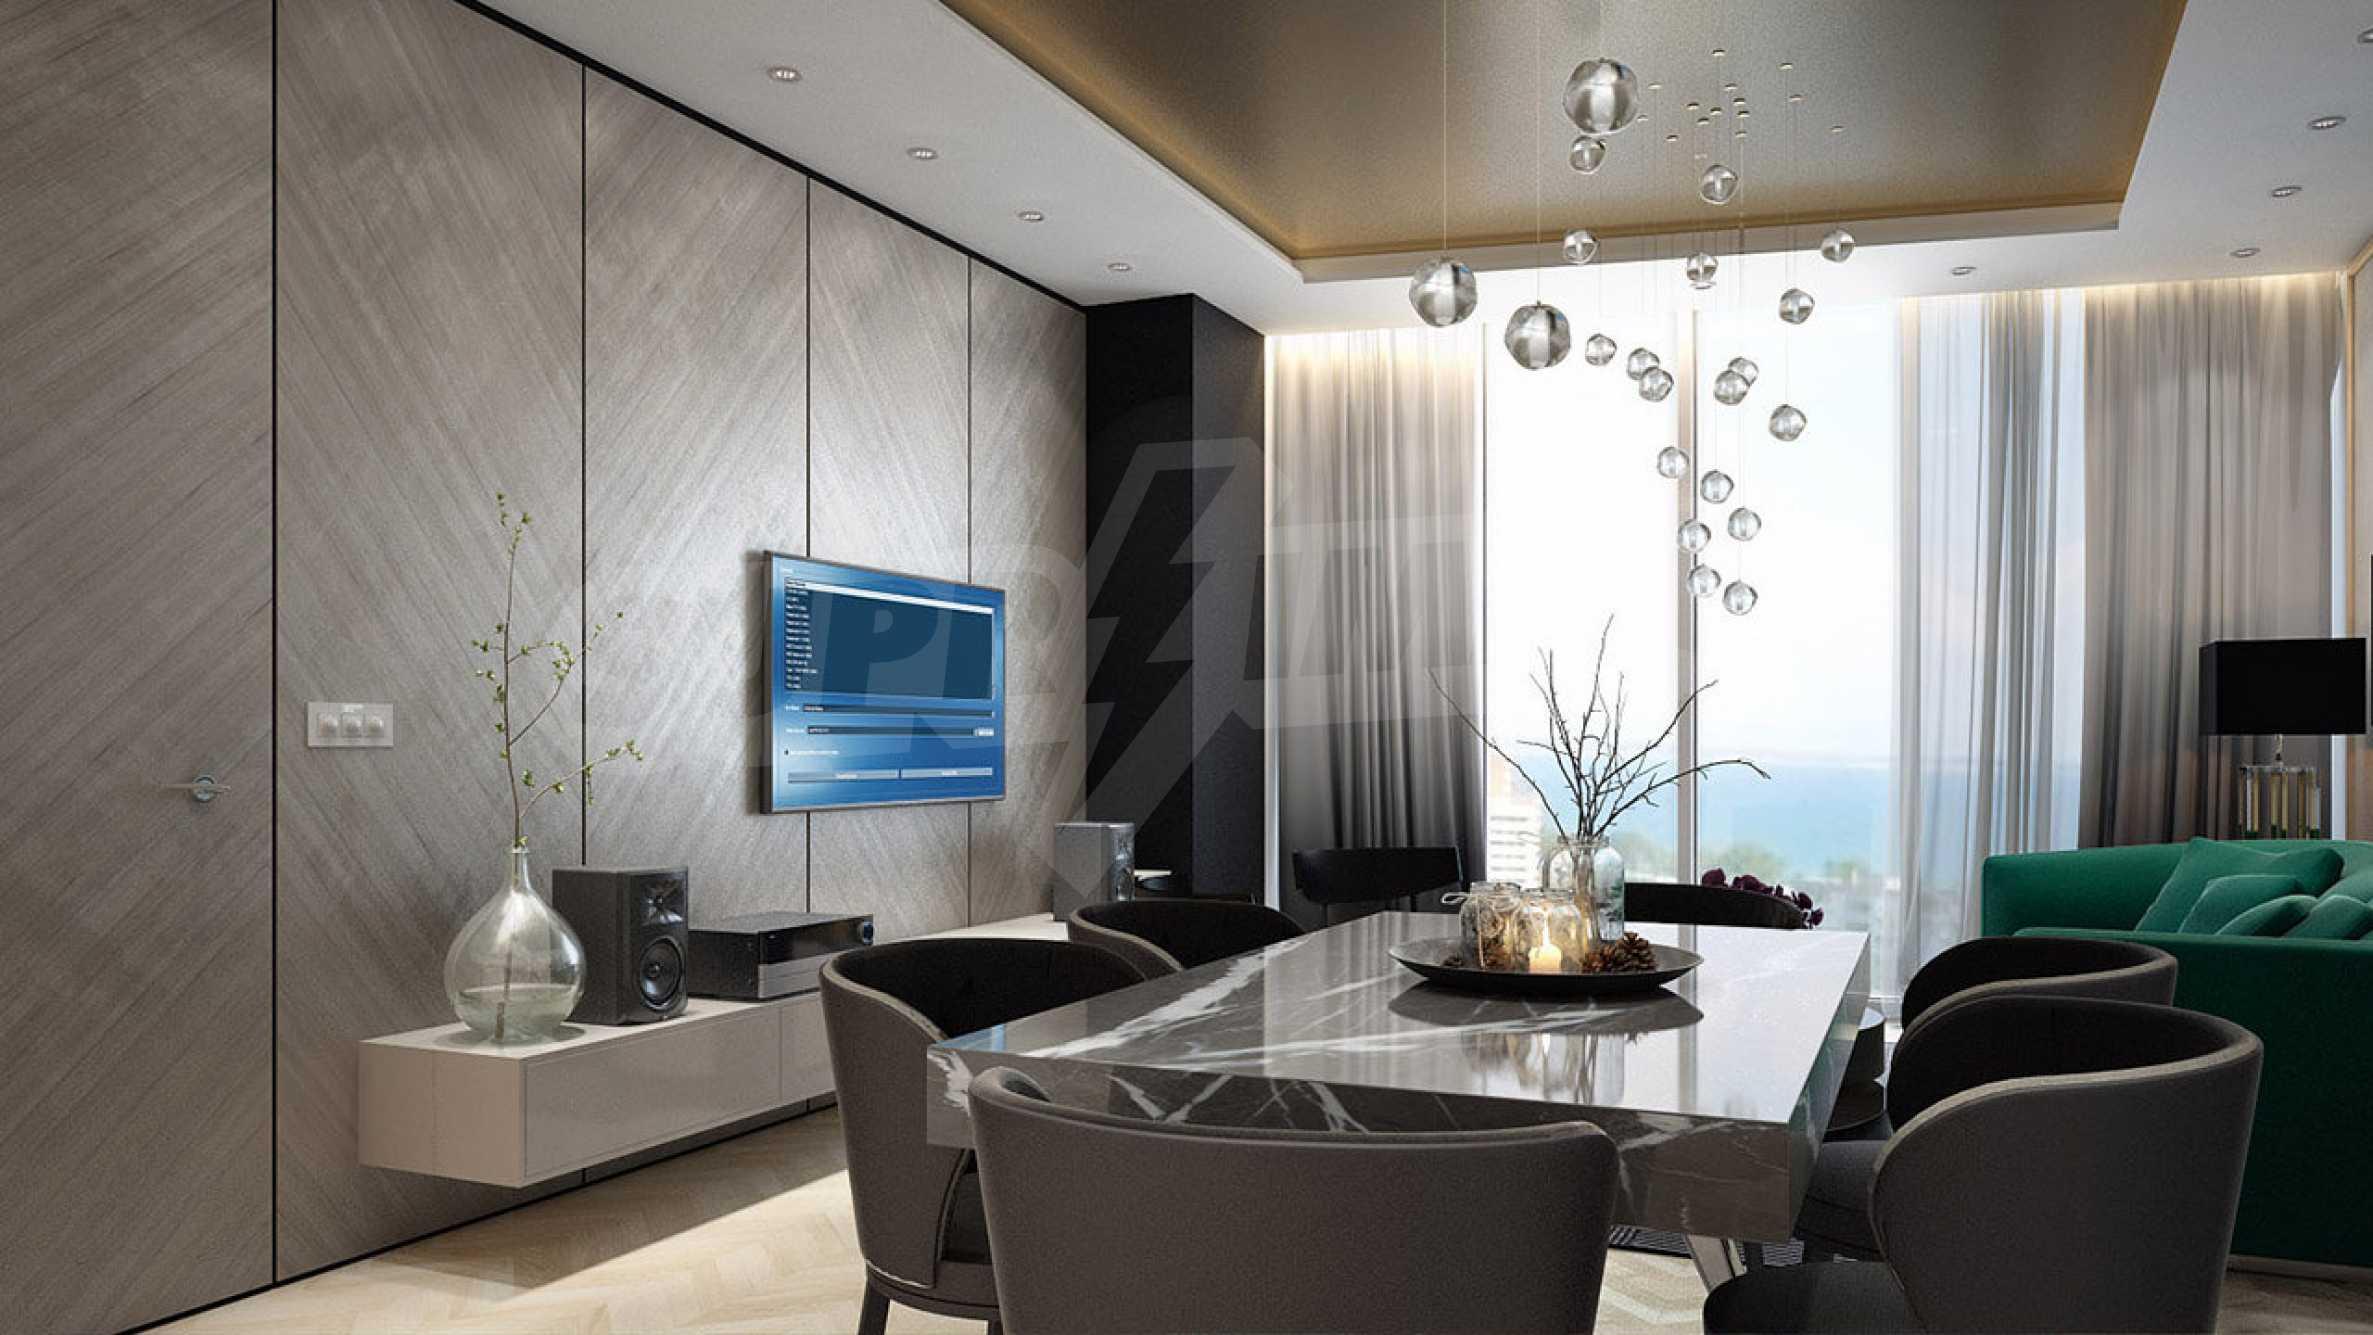 Нова сграда с луксозни апартаменти в гр. Бургас 45